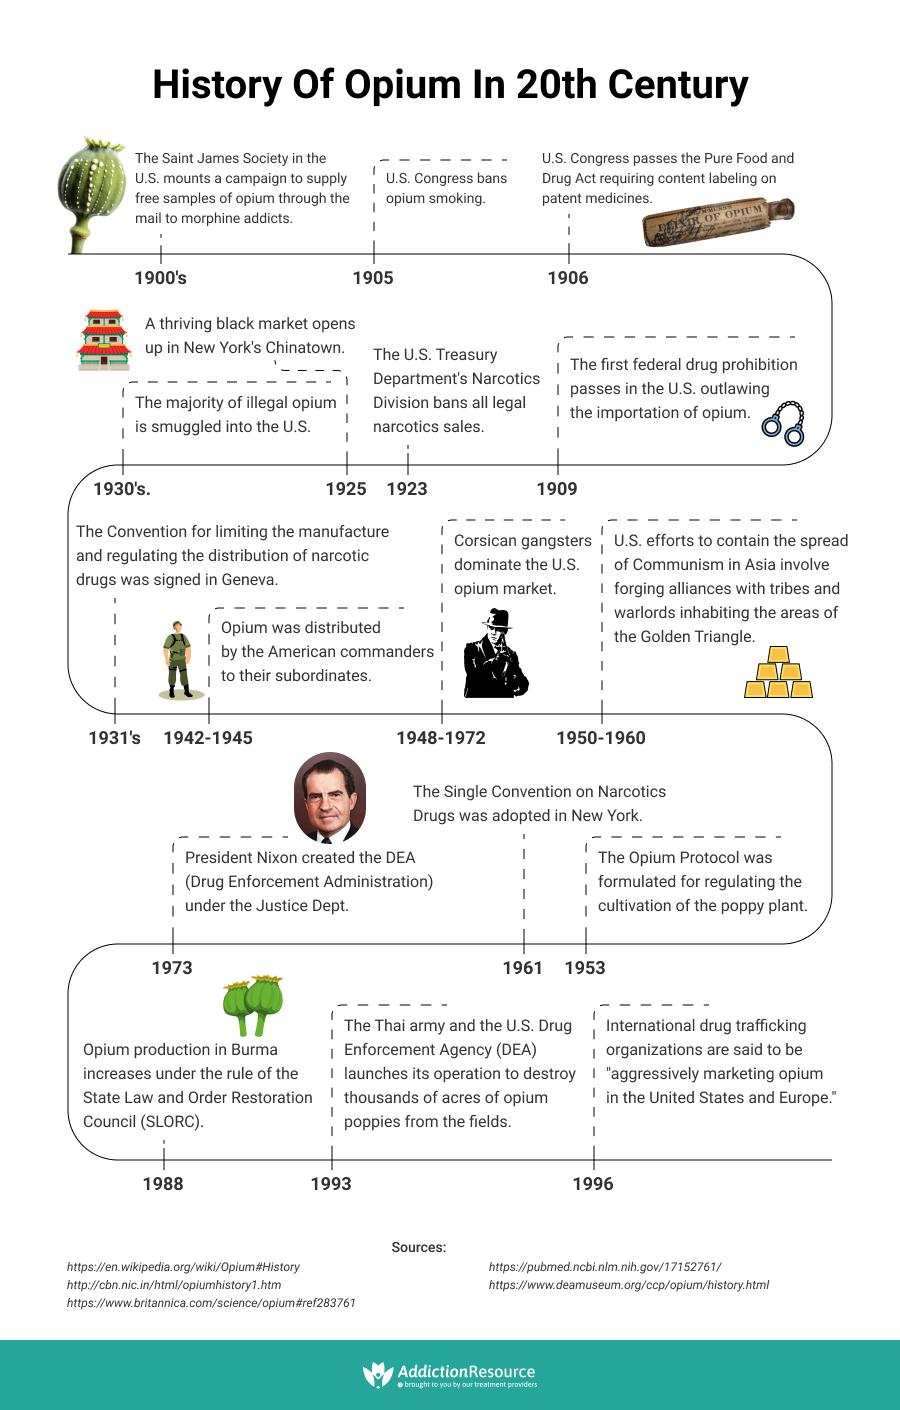 Opium history in 20th century